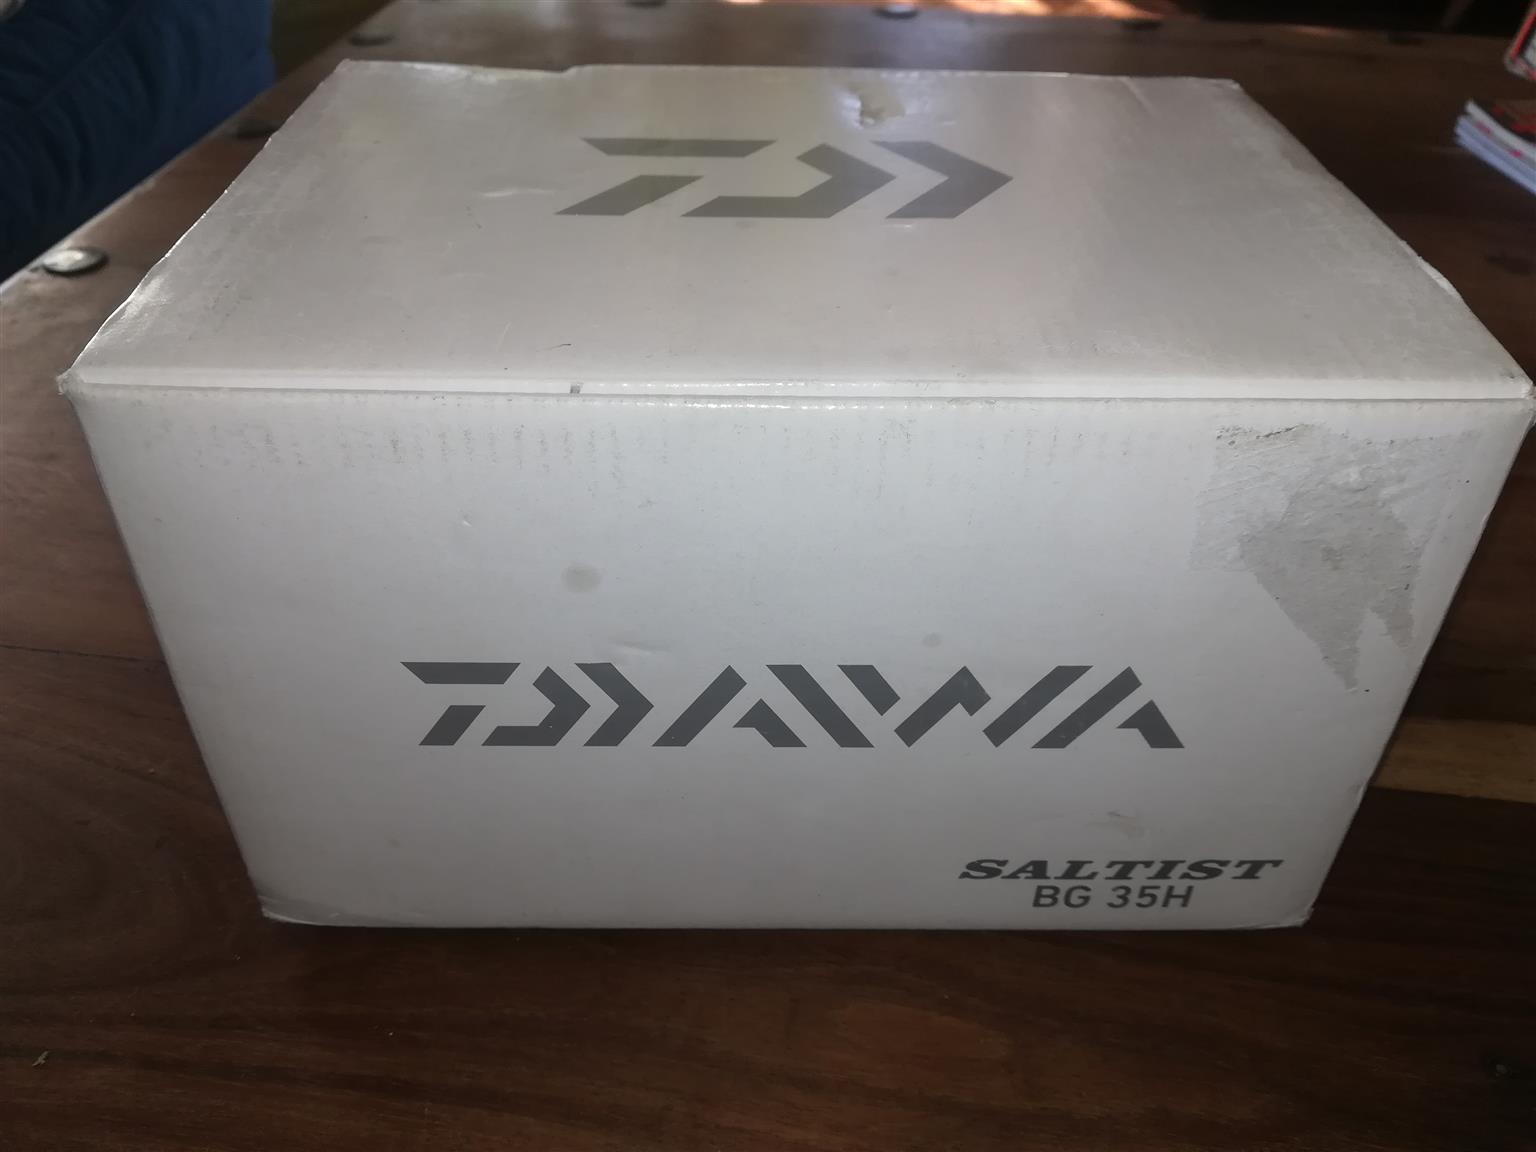 Brand new Daiwa saltist BG 35H